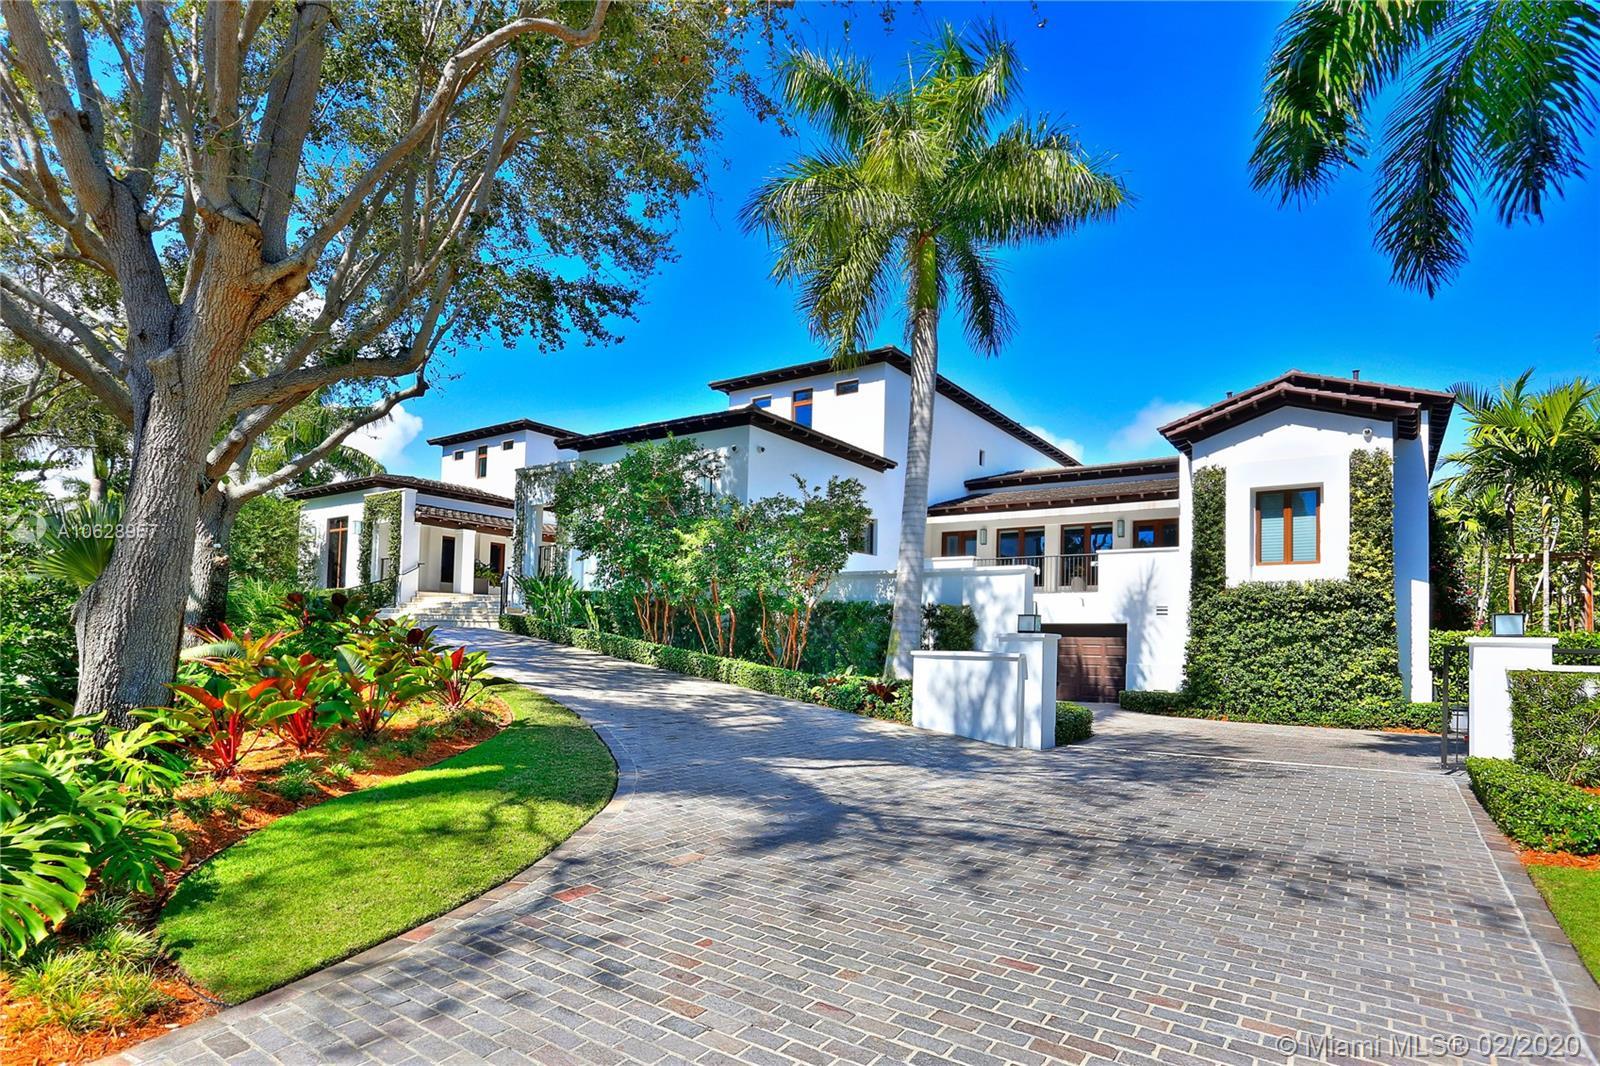 555 Arvida Pkwy, Kendall, Florida